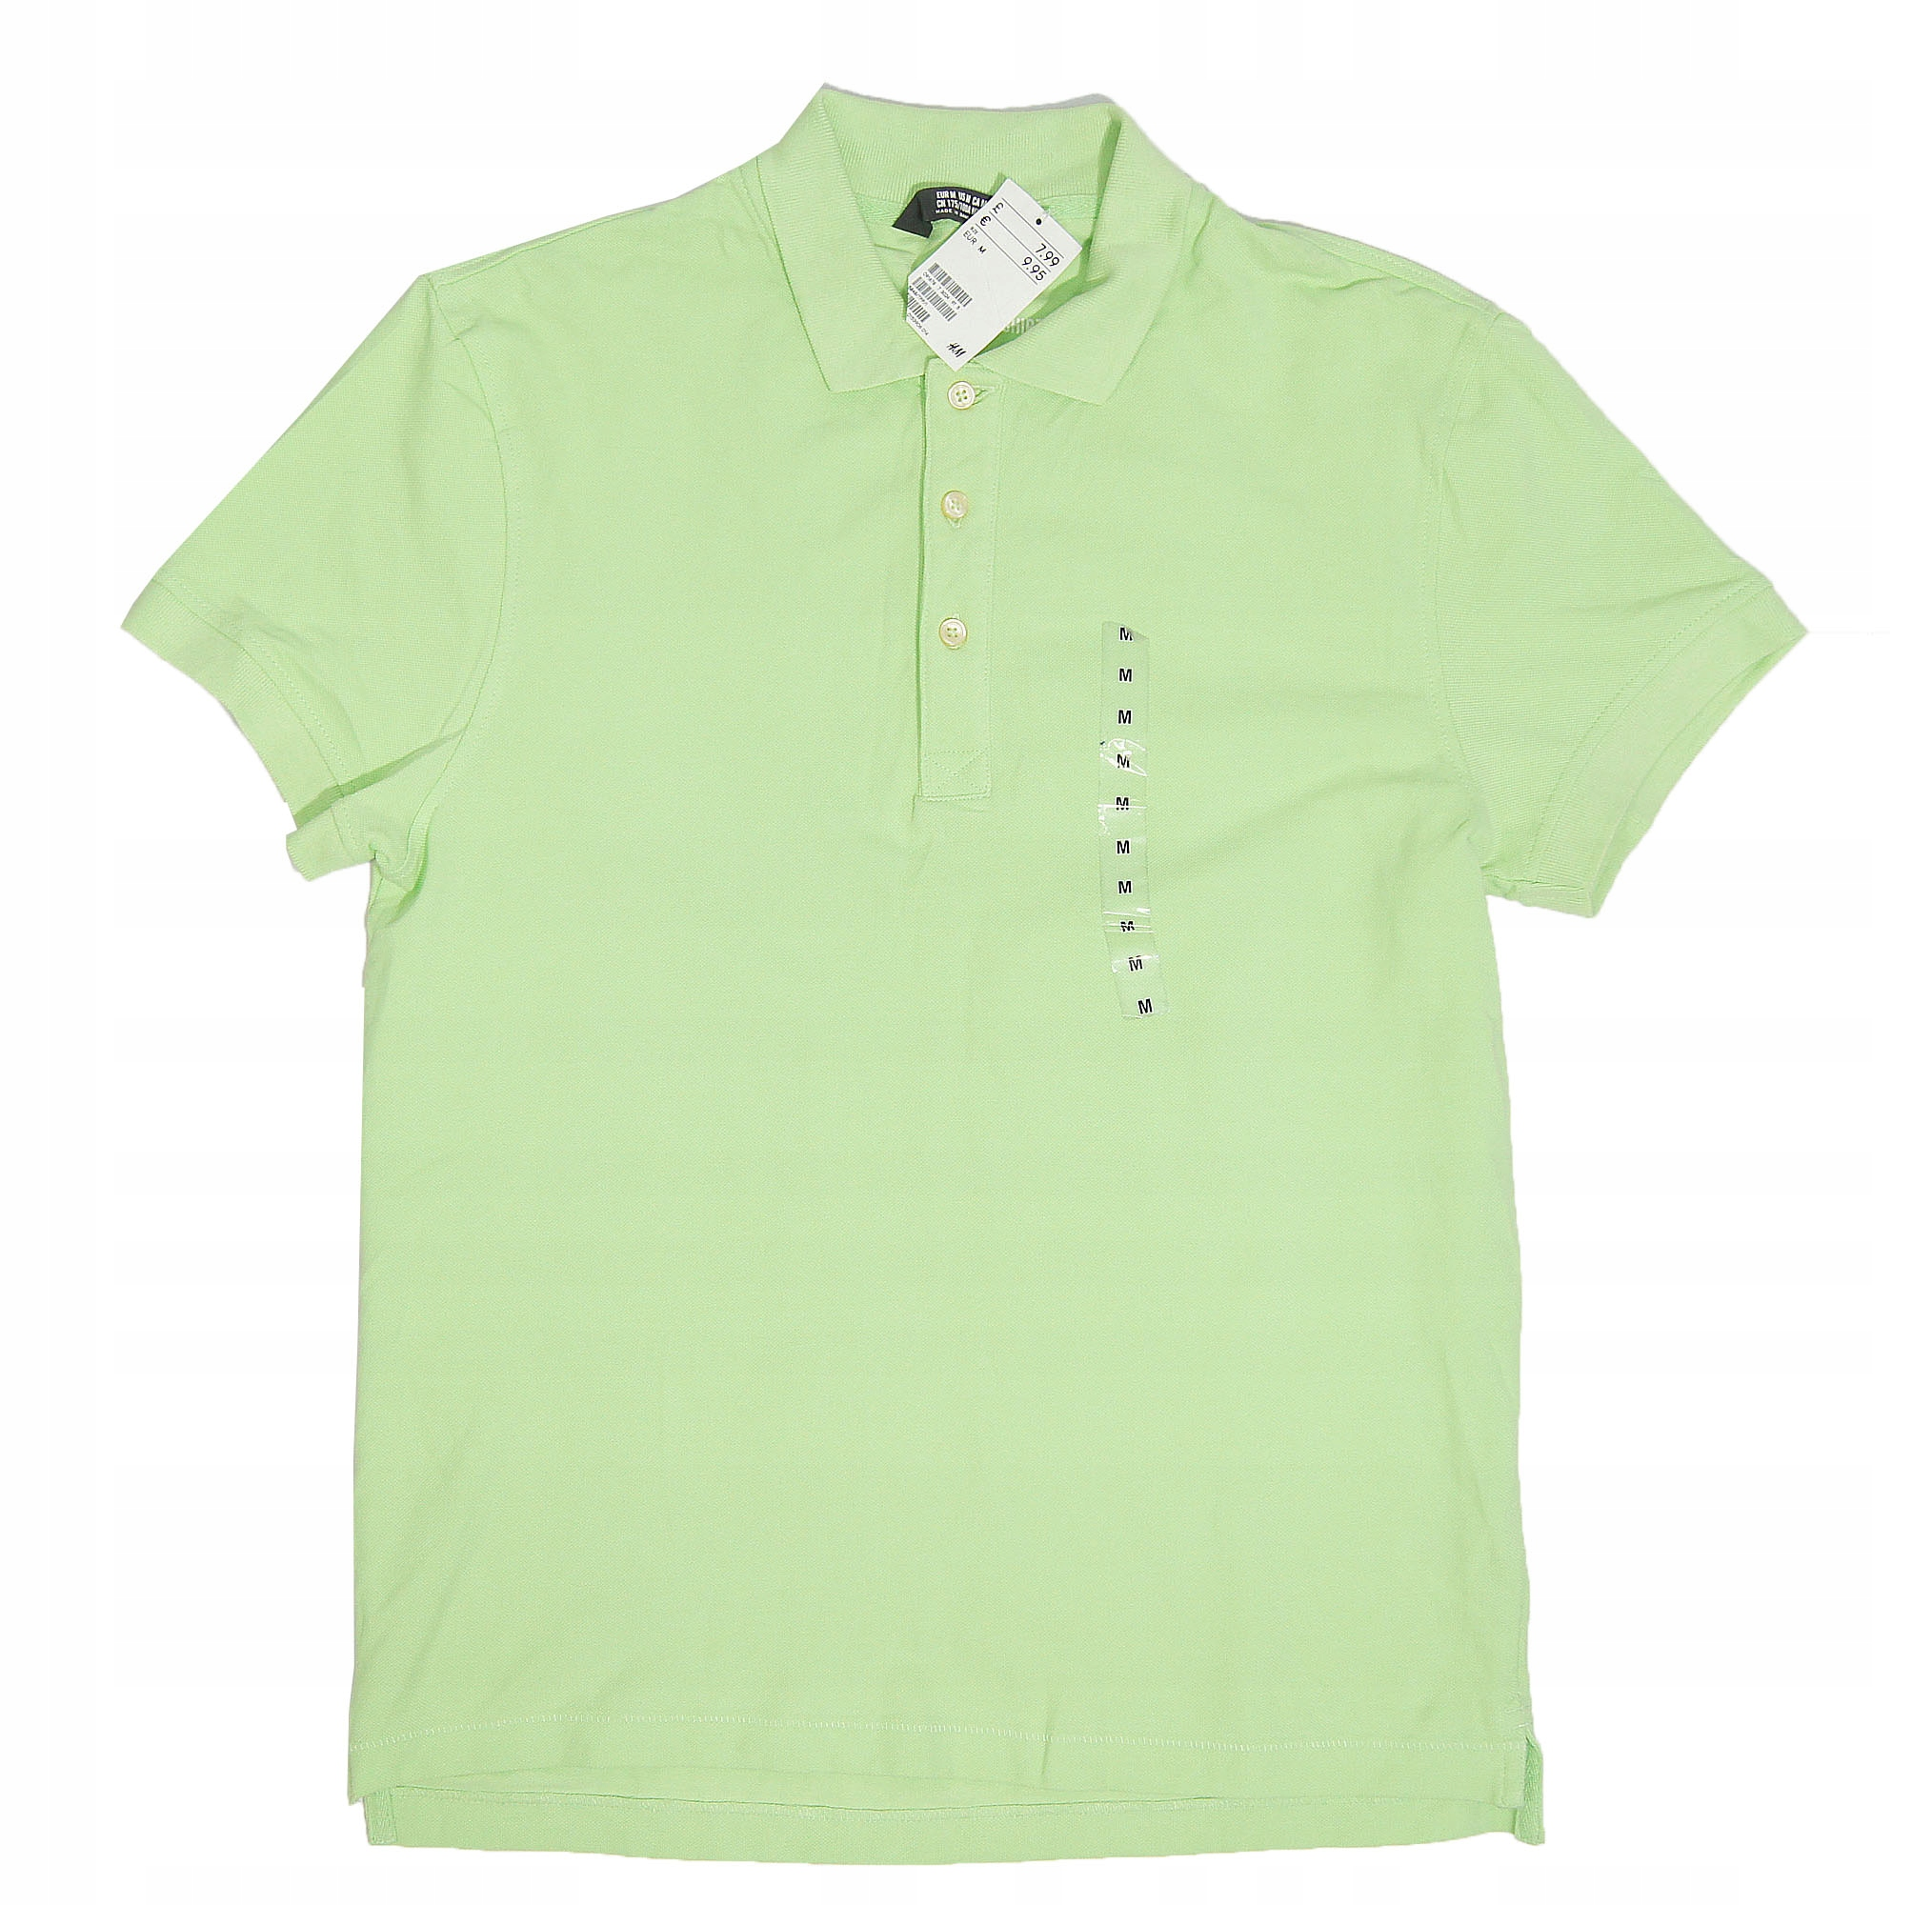 H&M Koszulka polo męska Rozm. M